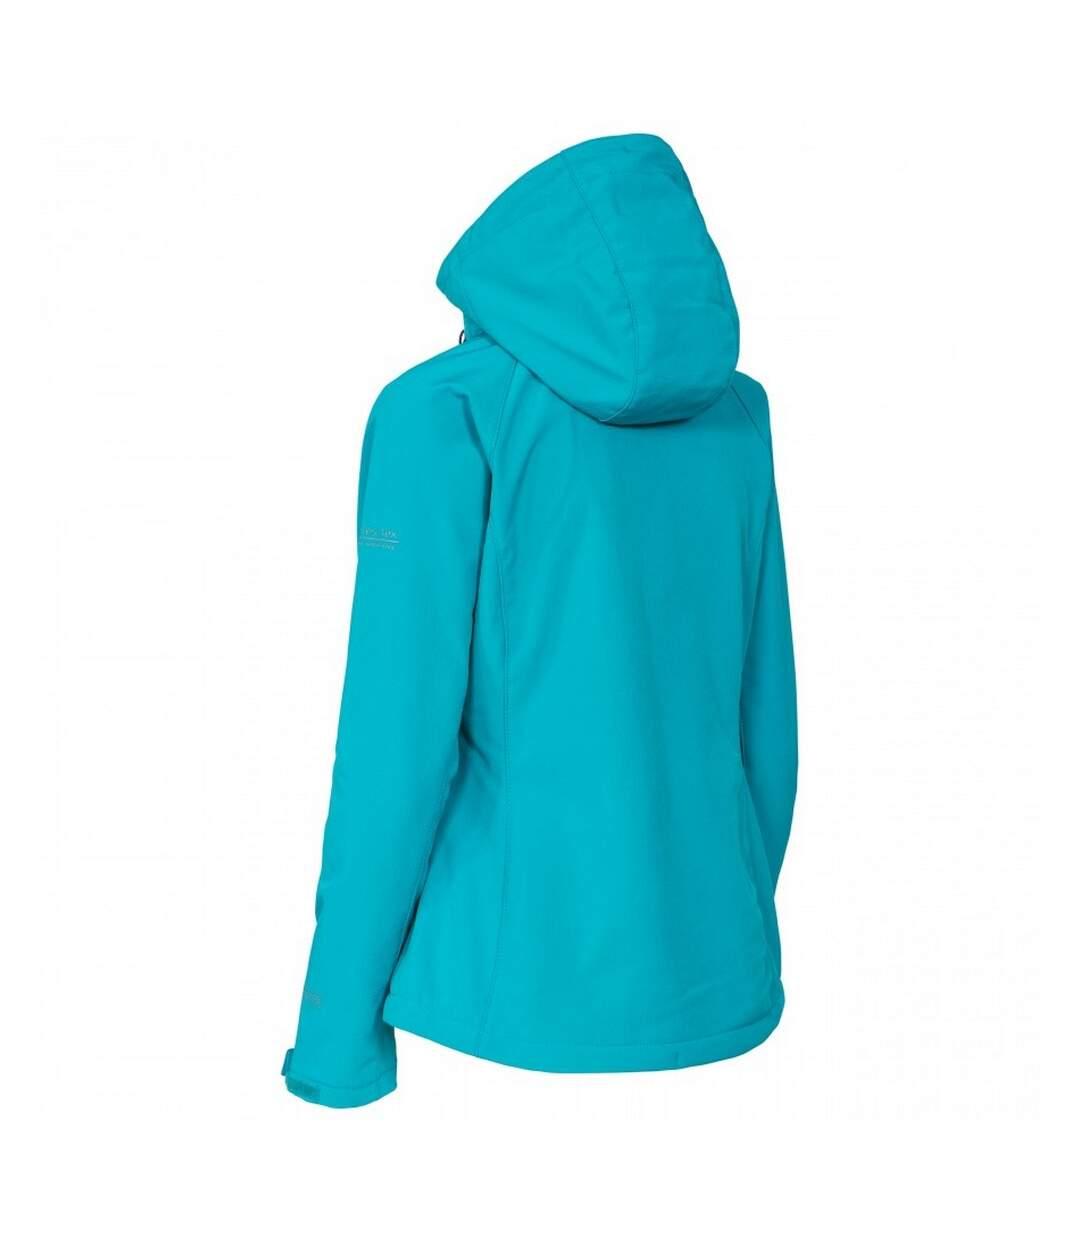 Trespass Womens/Ladies Bela II Waterproof Softshell Jacket (Marine) - UTTP3440